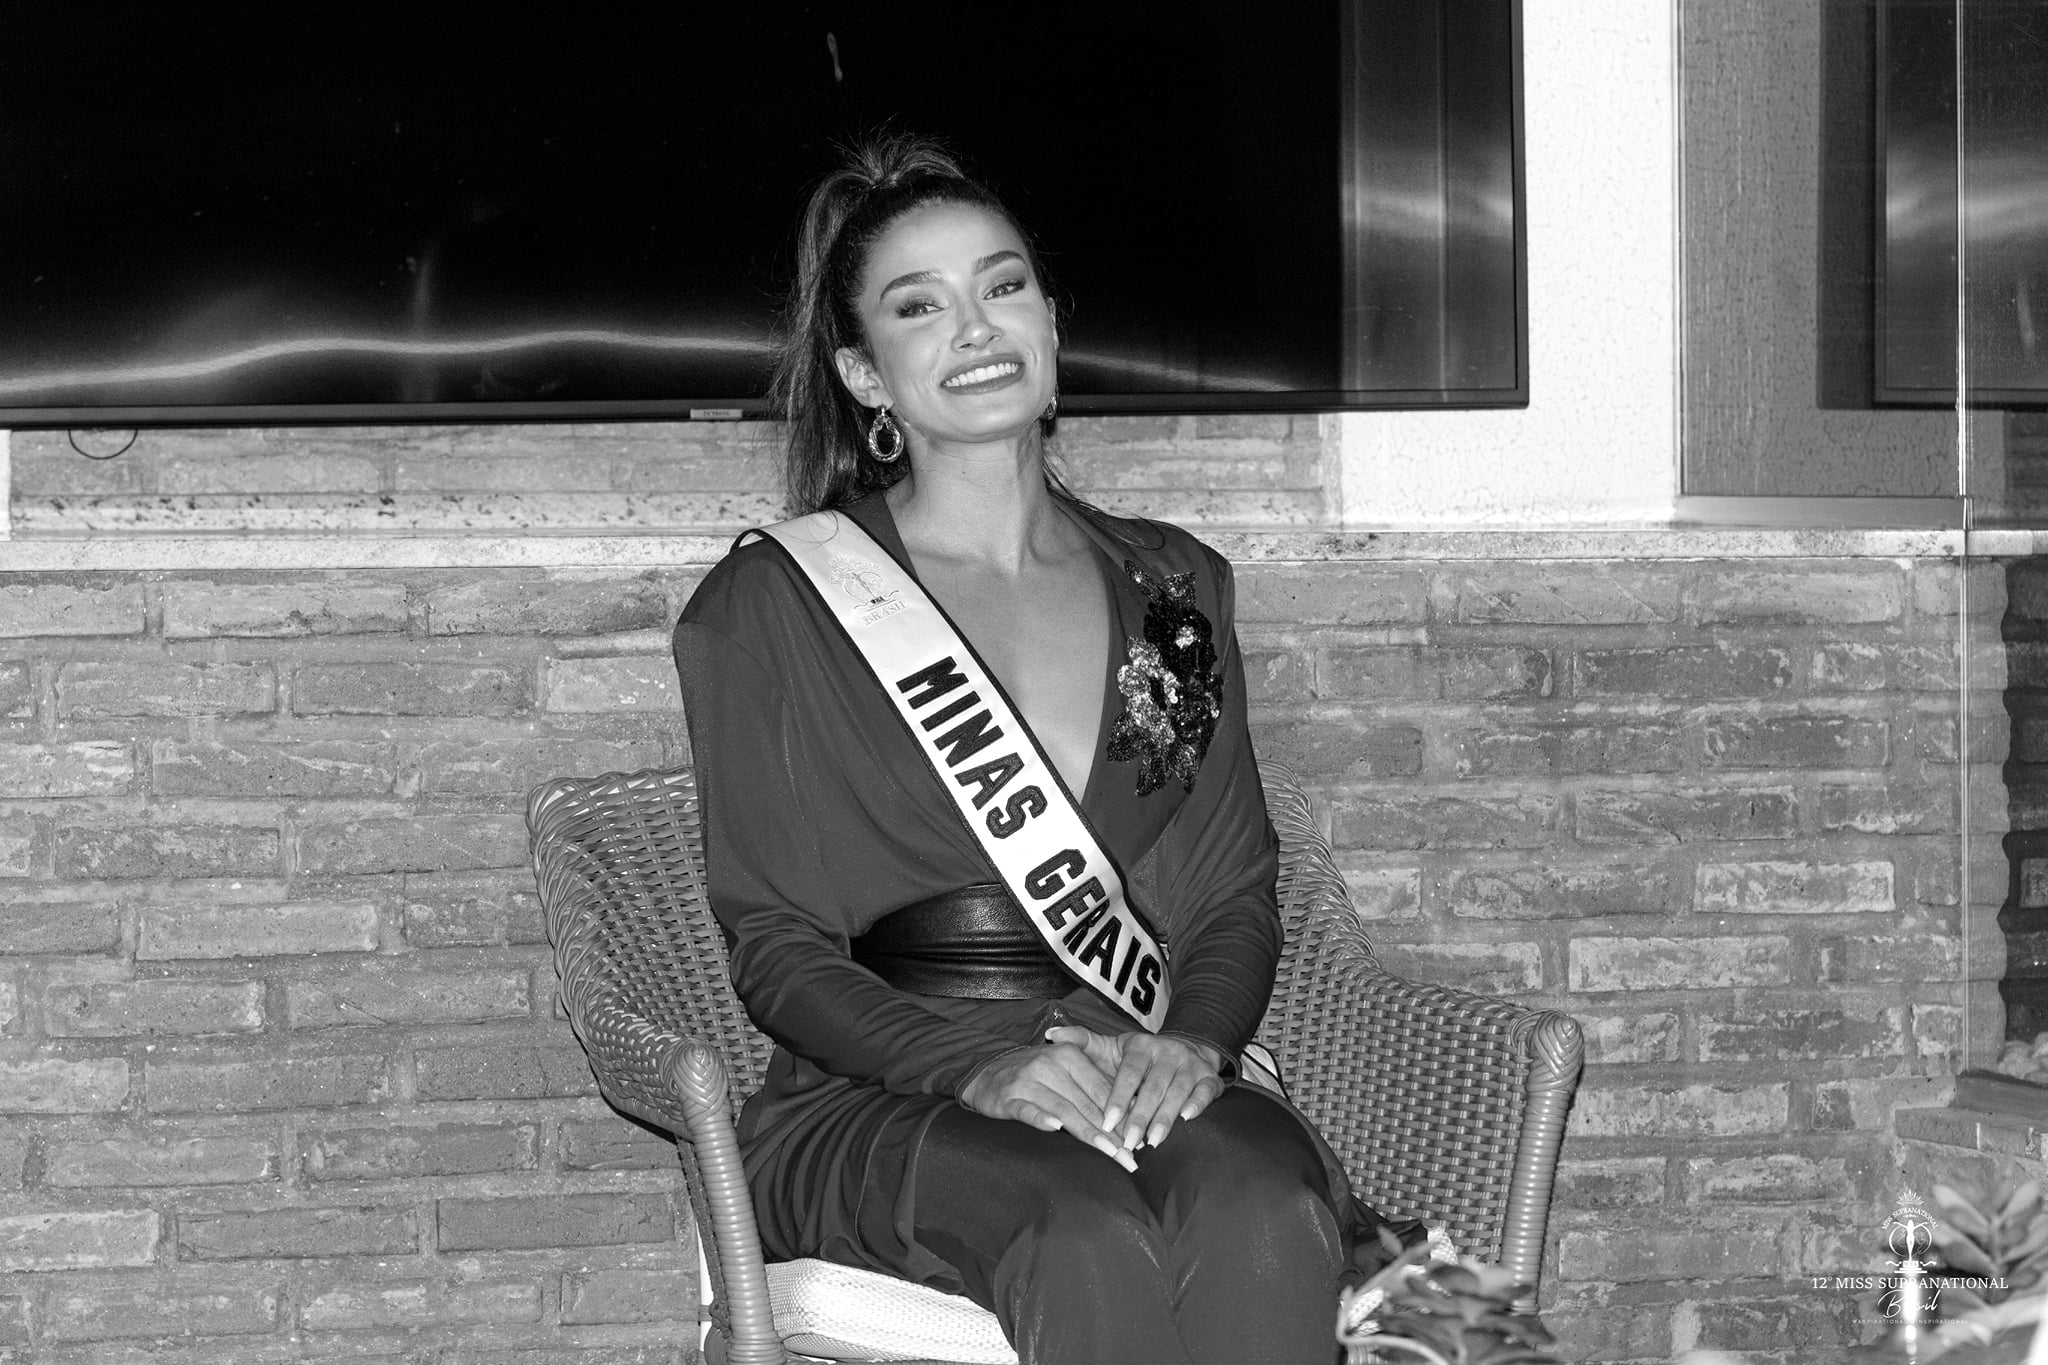 luma russo, top 3 de miss supranational brazil 2020. - Página 3 12754010